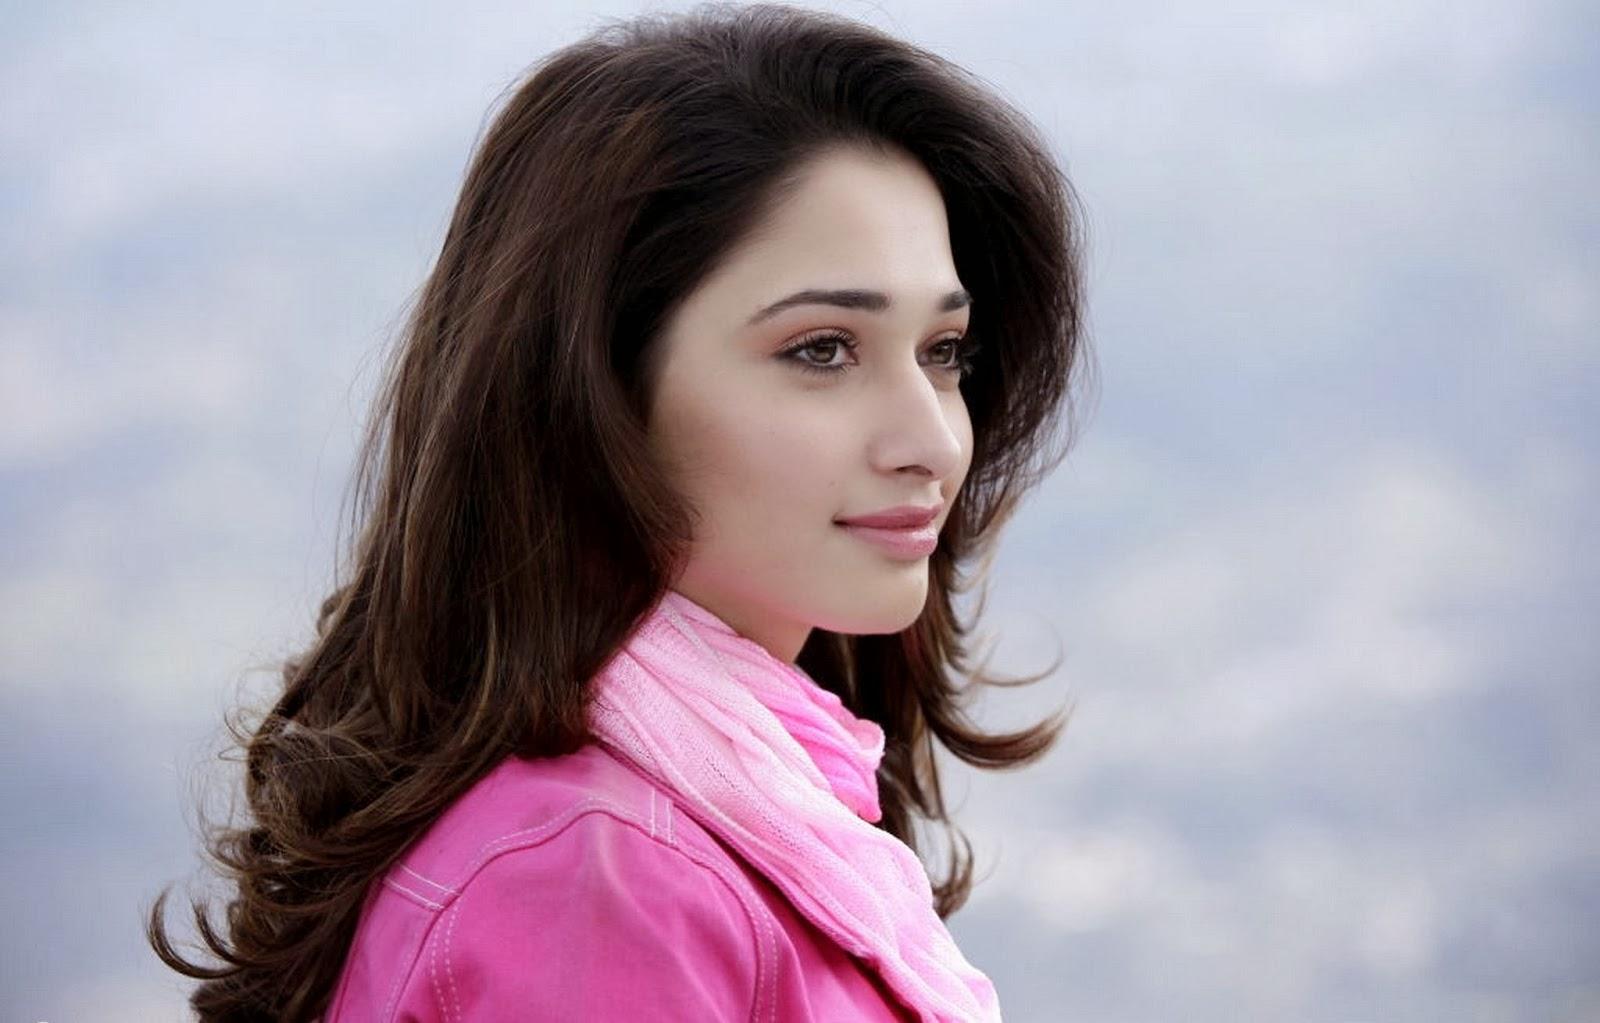 Tamanna Beautiful: Tamannah Bhatia HD Wallpapers 2014 Free Download